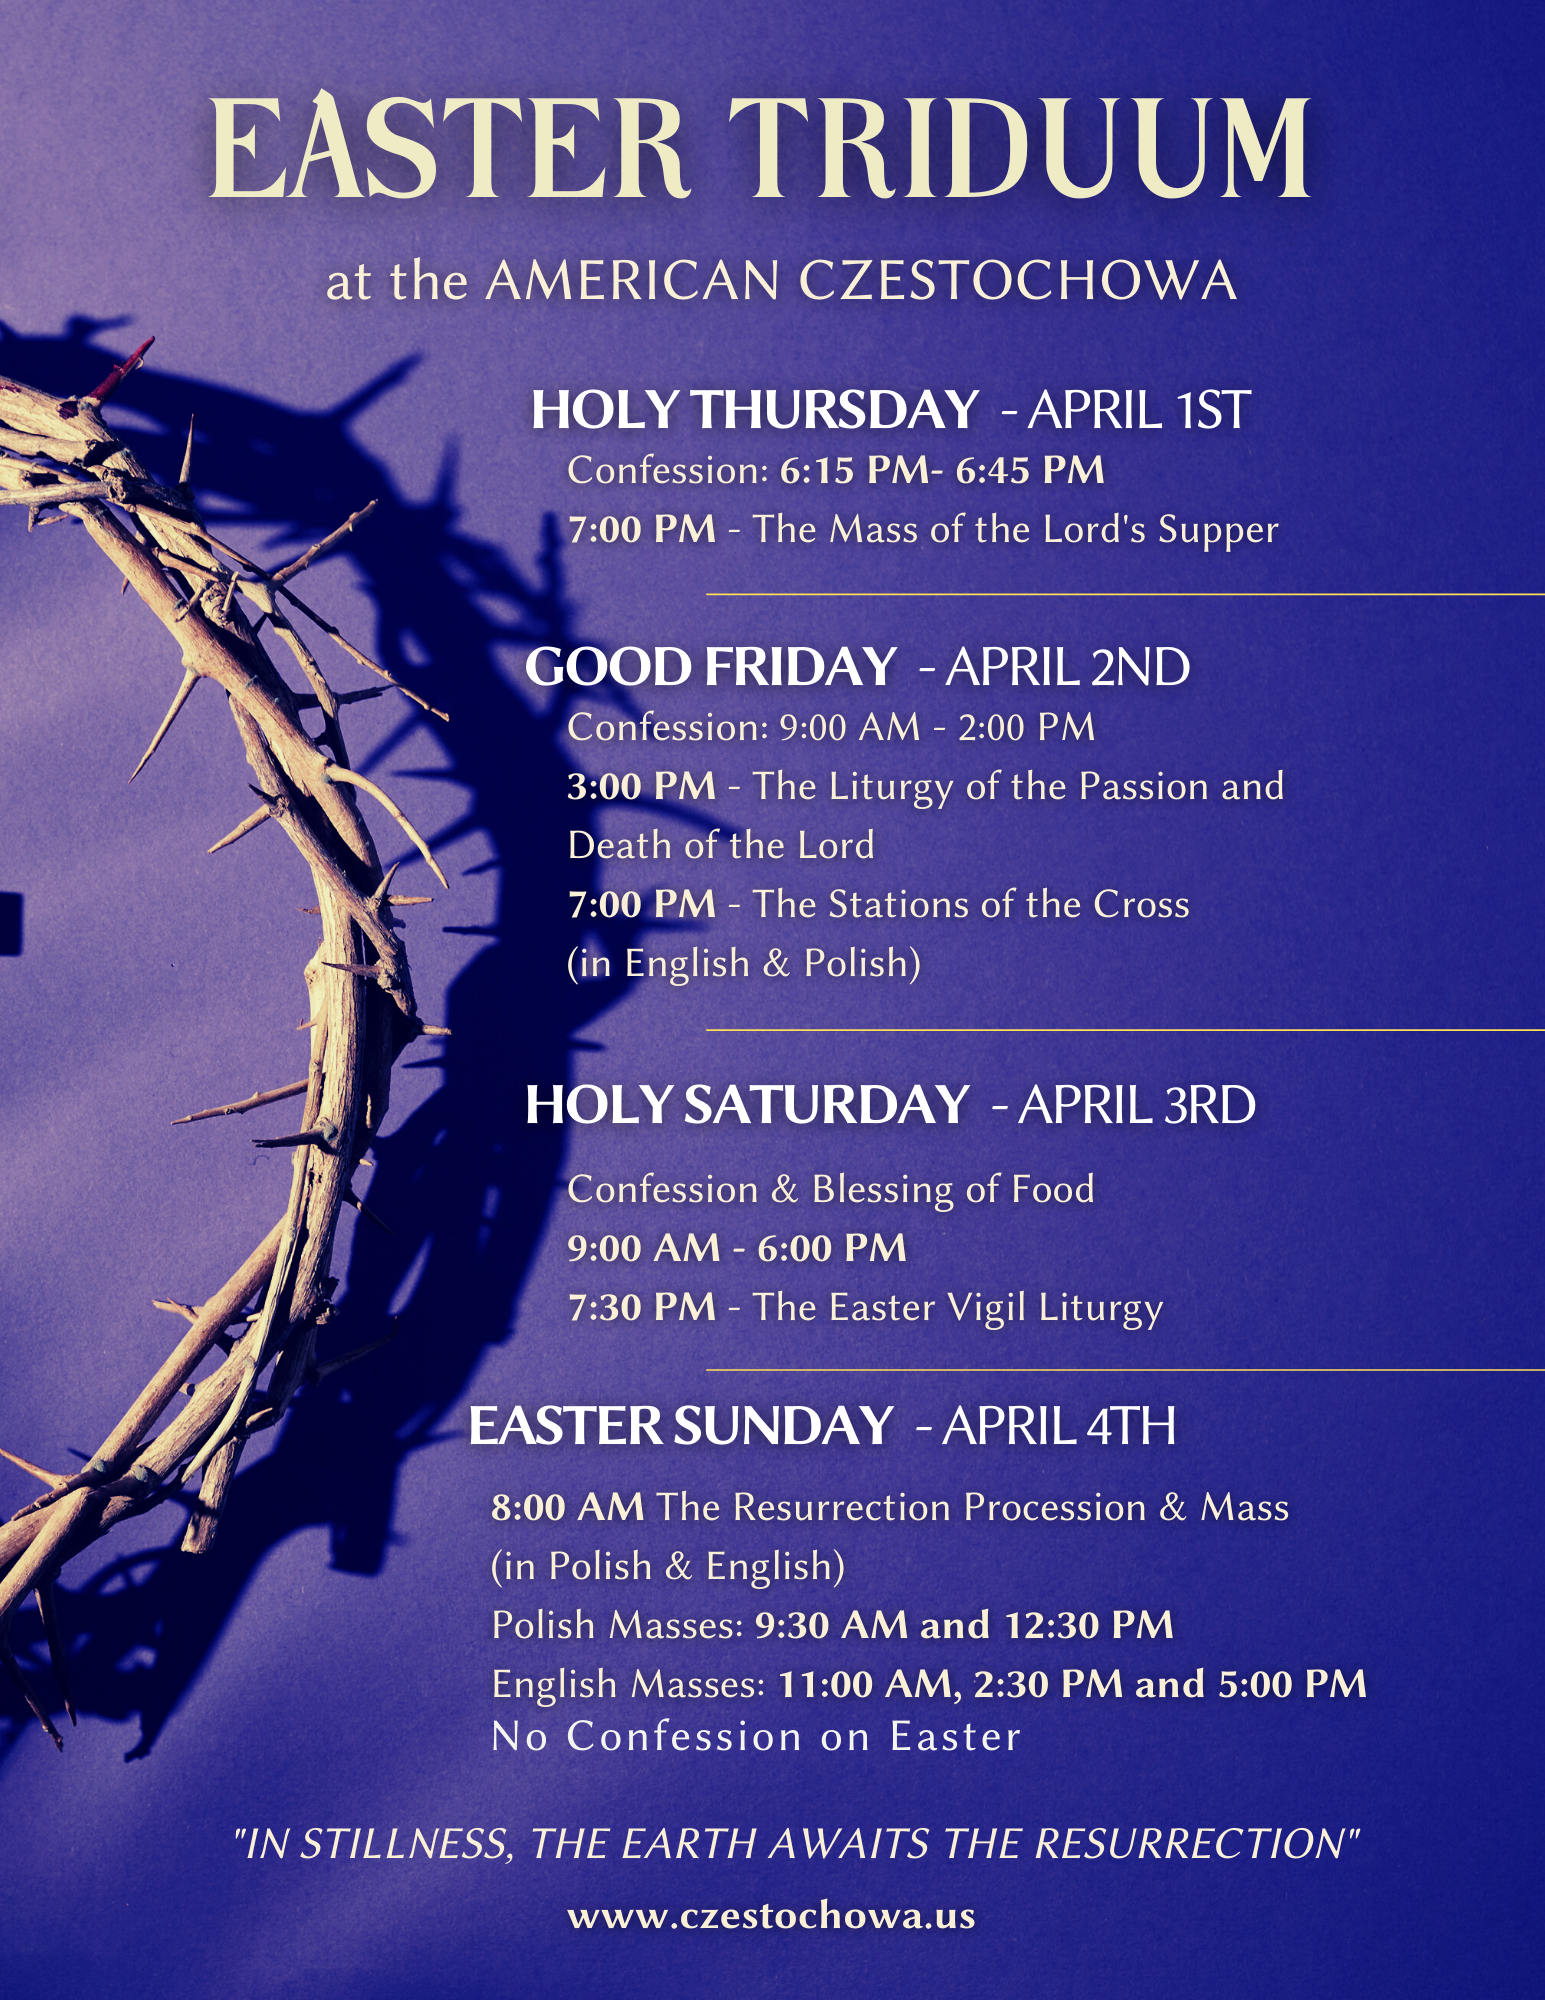 Easter Triduum at American Czestochowa